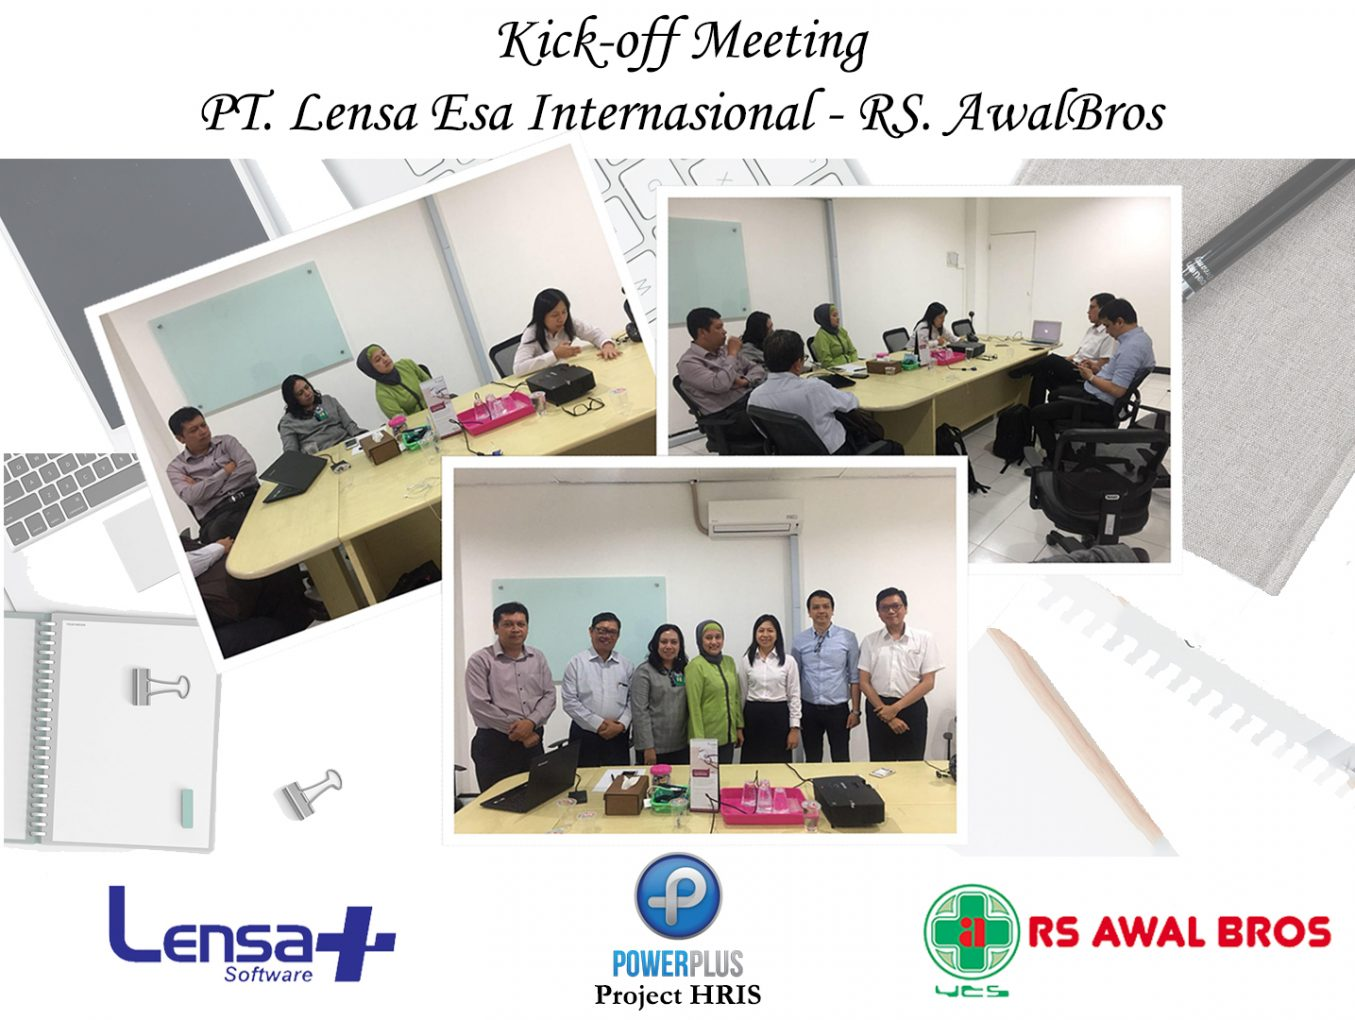 Kick-off Meeting PT. Lensa Esa Internasional & RS. Awal Bros